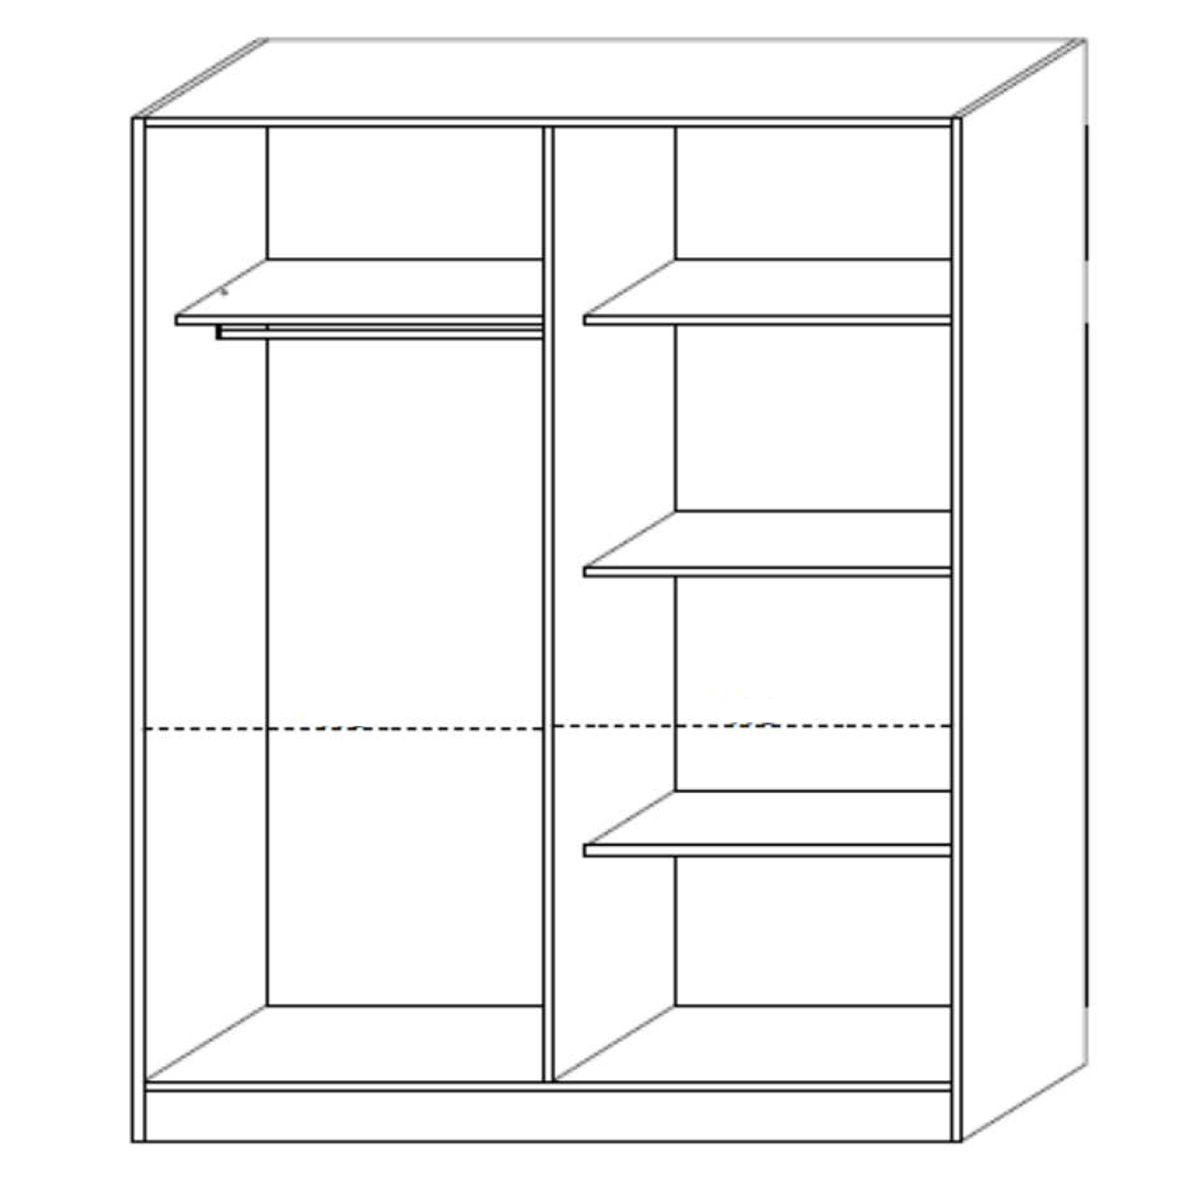 Altobuy-Solaya-Chambre-Complete-avec-Lit-160x200cm-Neuf miniature 4